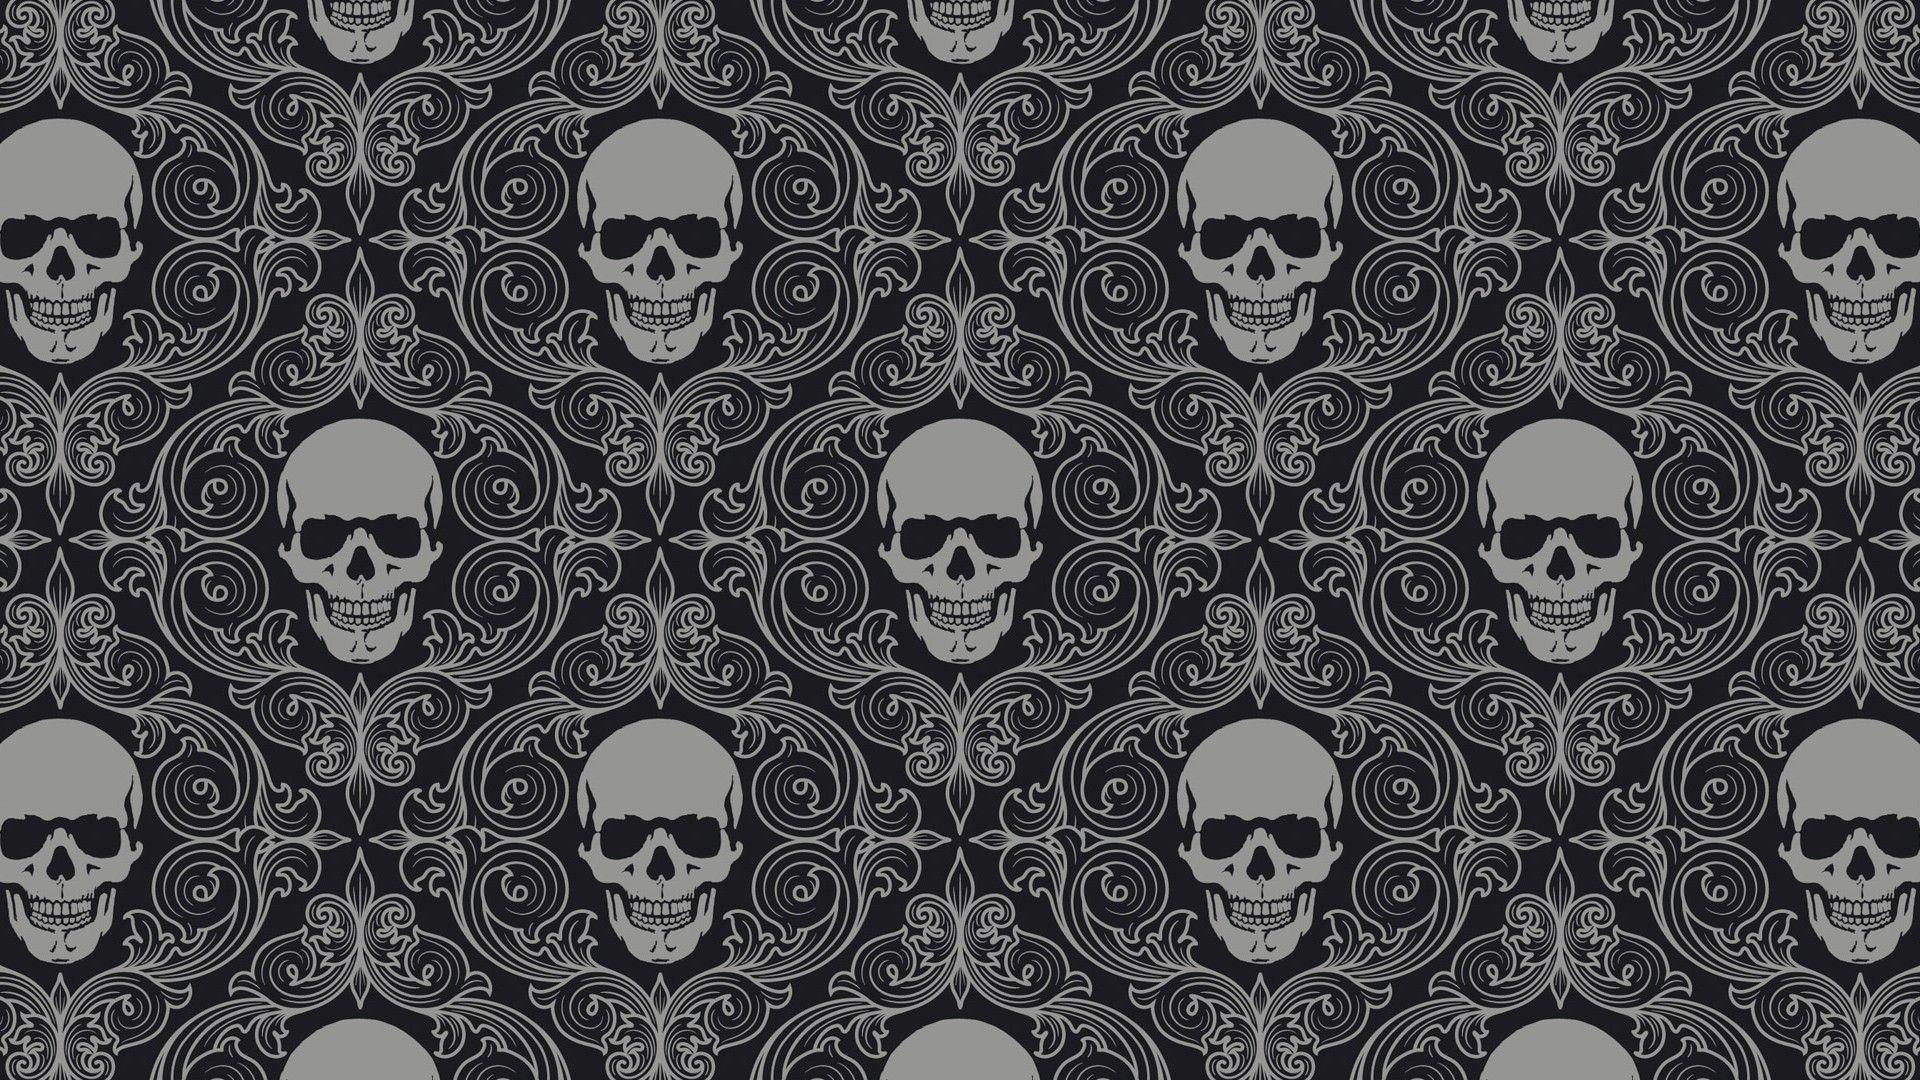 gothic patterns wallpaper pattern - photo #43